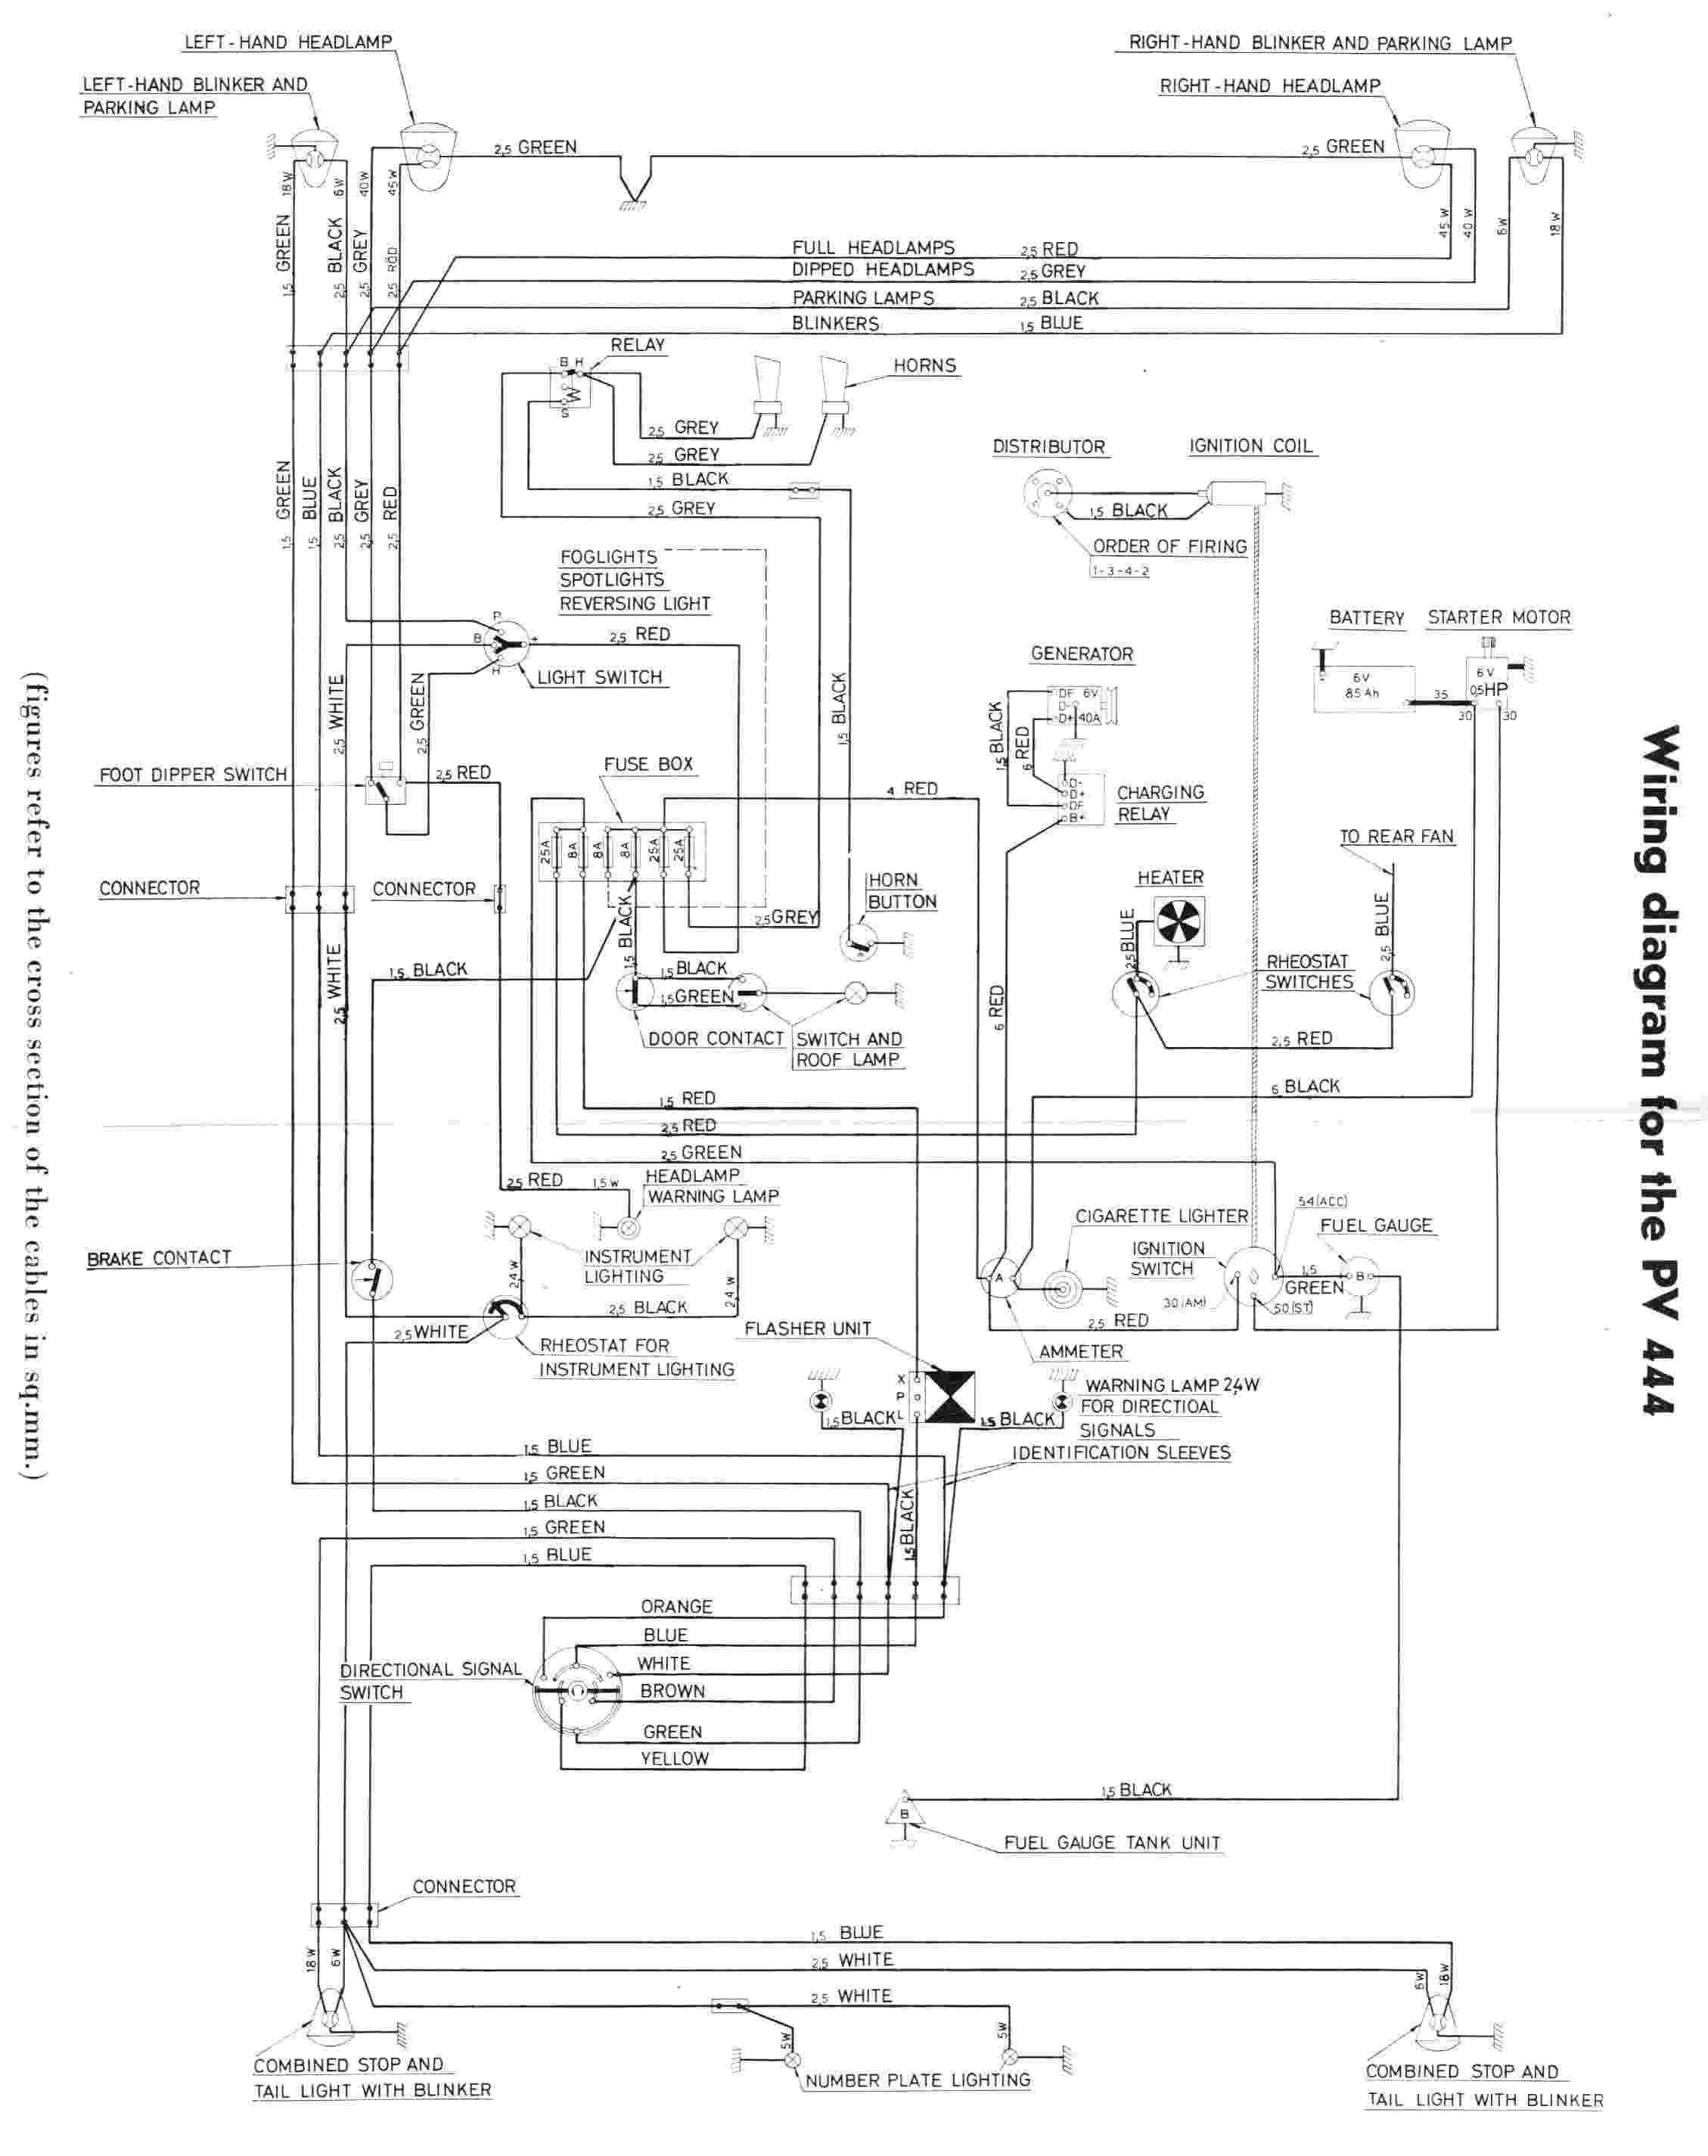 1993 volvo 240 fuse diagram [ 2258 x 2850 Pixel ]